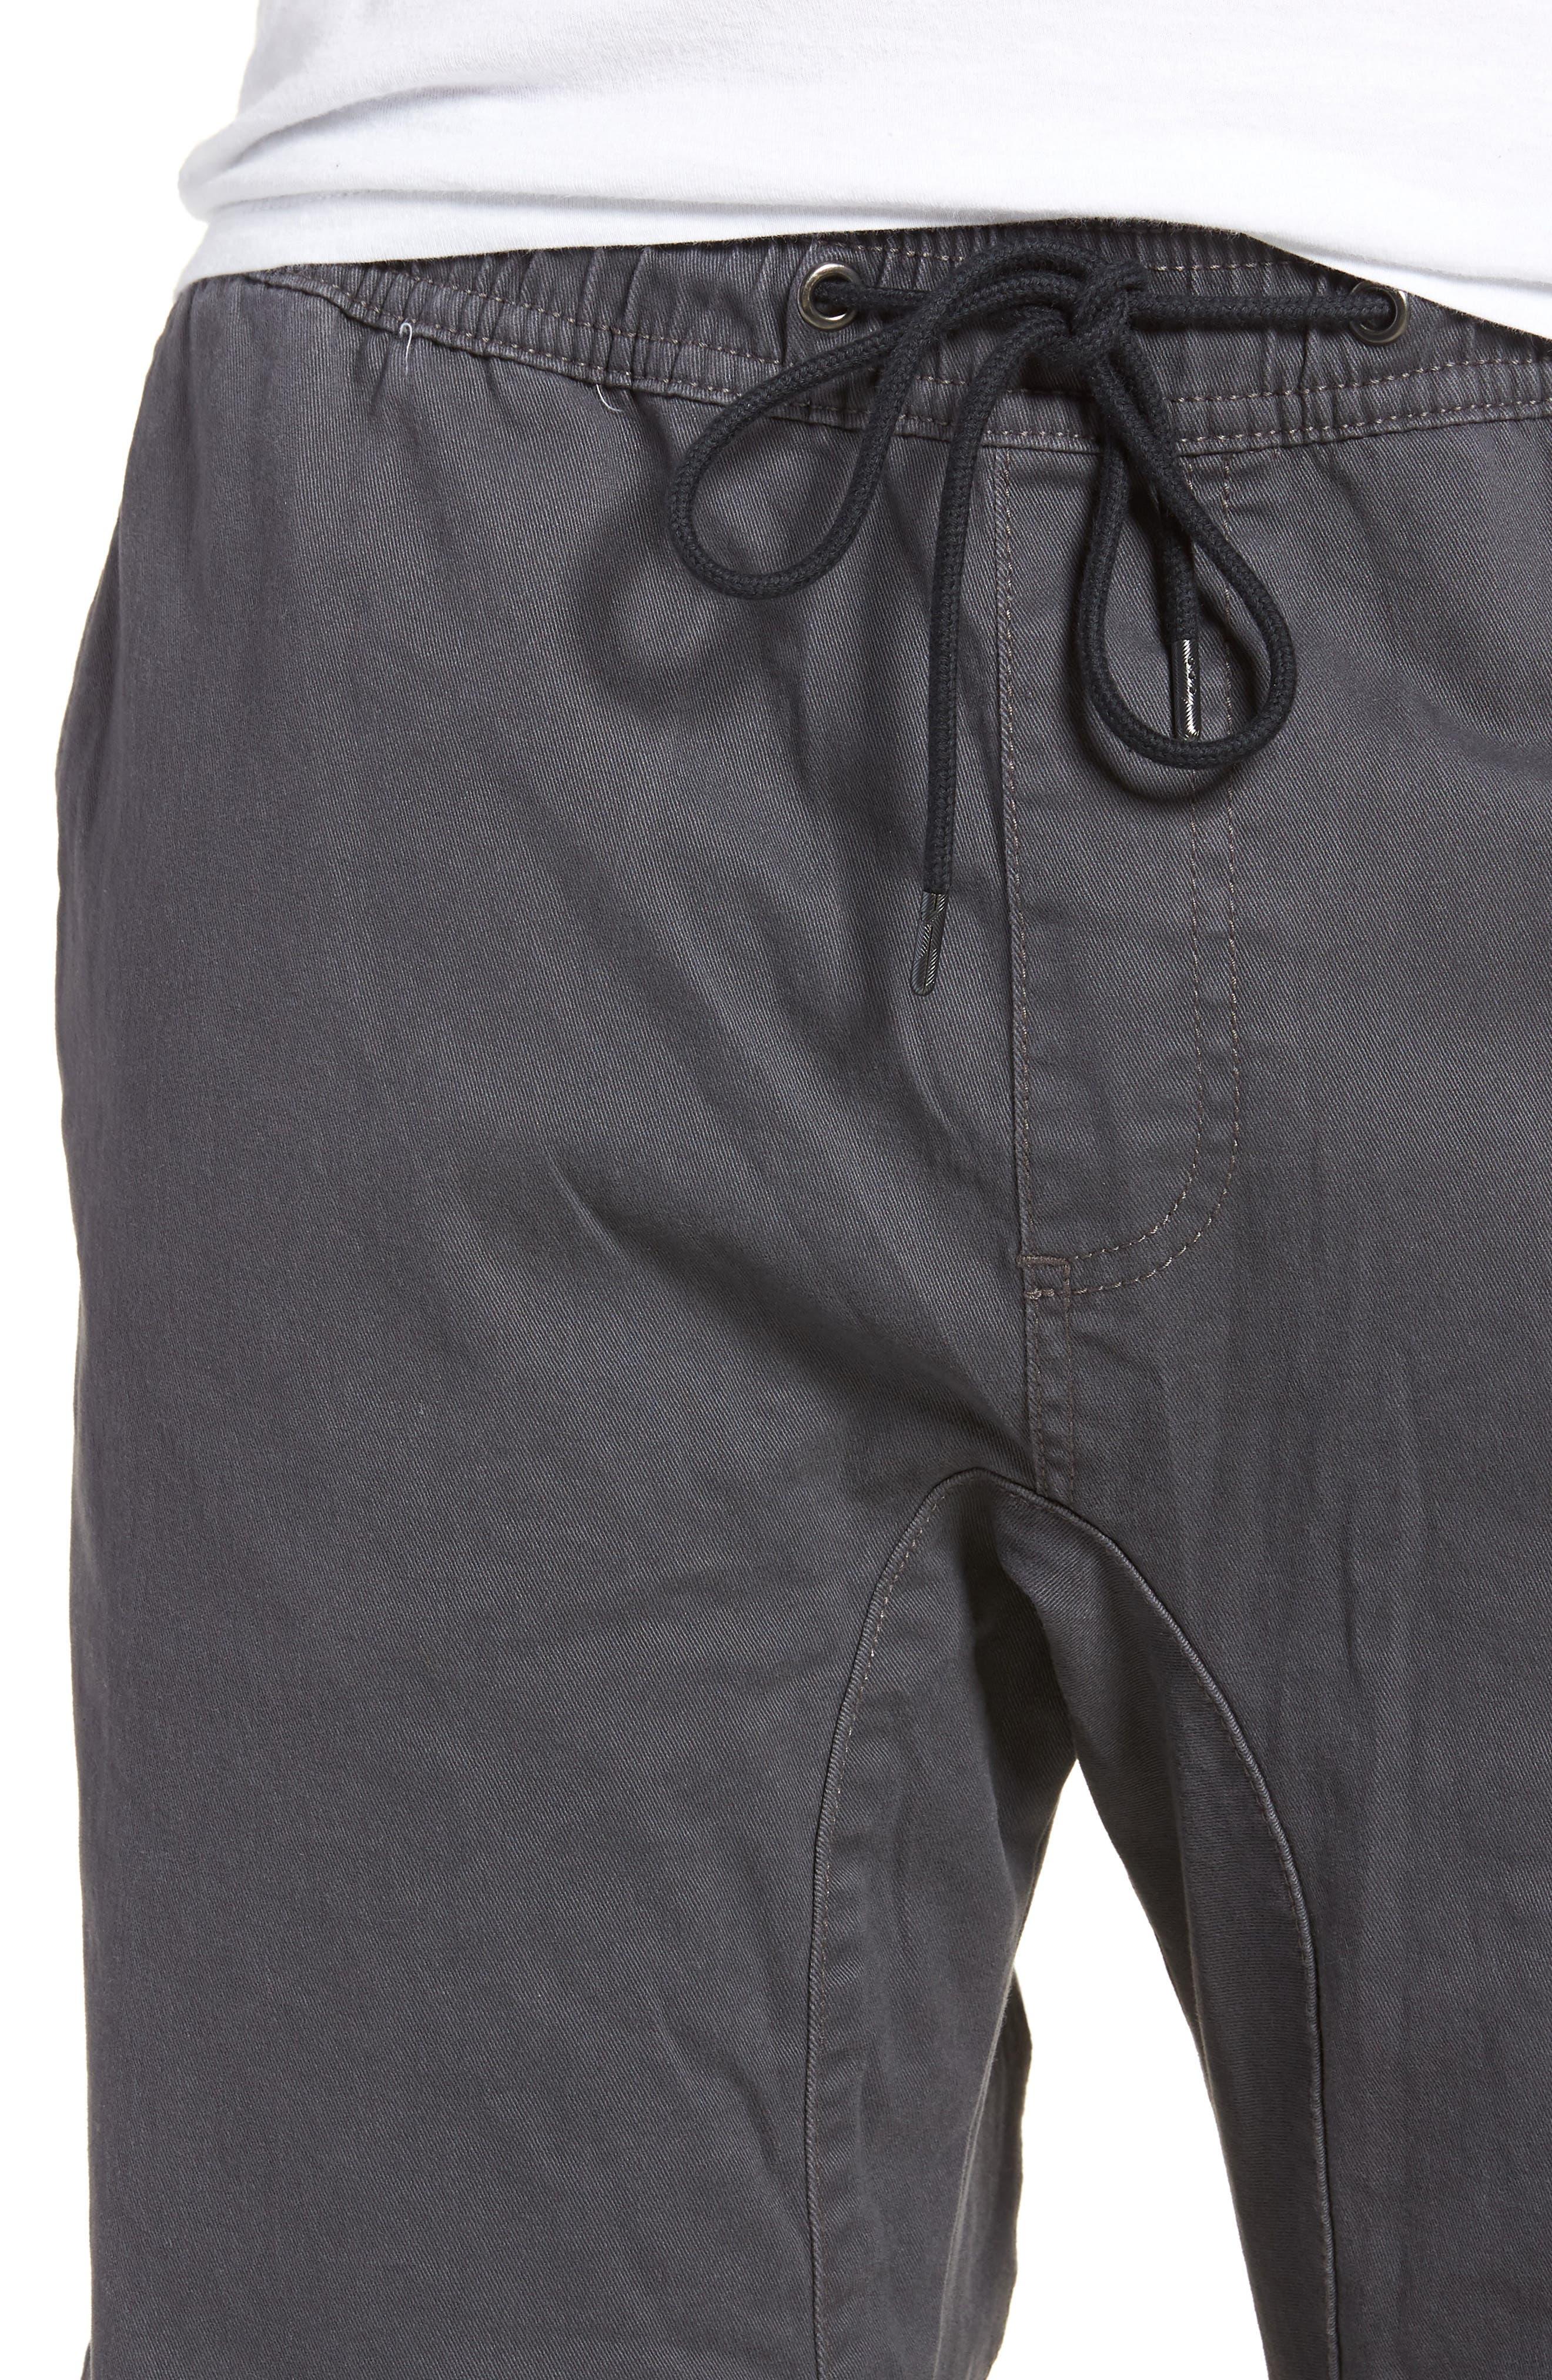 Jogger Pants,                             Alternate thumbnail 4, color,                             Grey Onyx